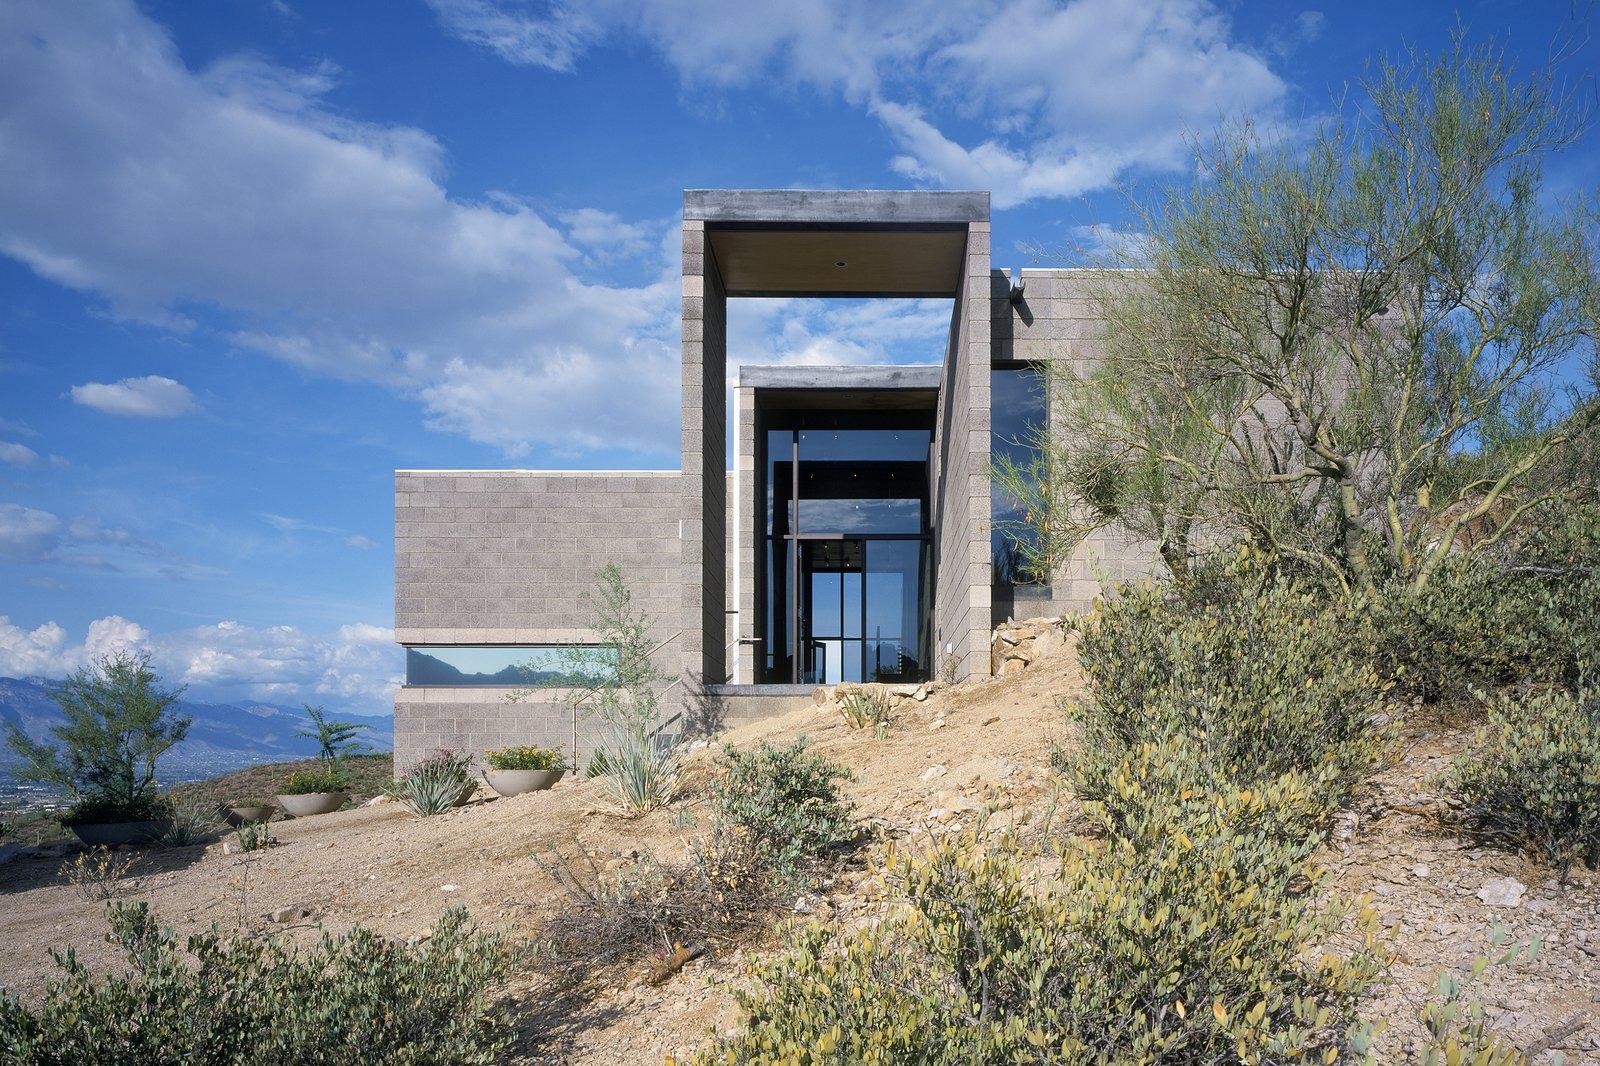 #modern #garciaresidence #ibarrarosanodesignarchitects #architecture #landscape #exterior #arizona #backyard #outdoor #glass #glassdoor   Garcia Residence by Ibarra Rosano Design Architects